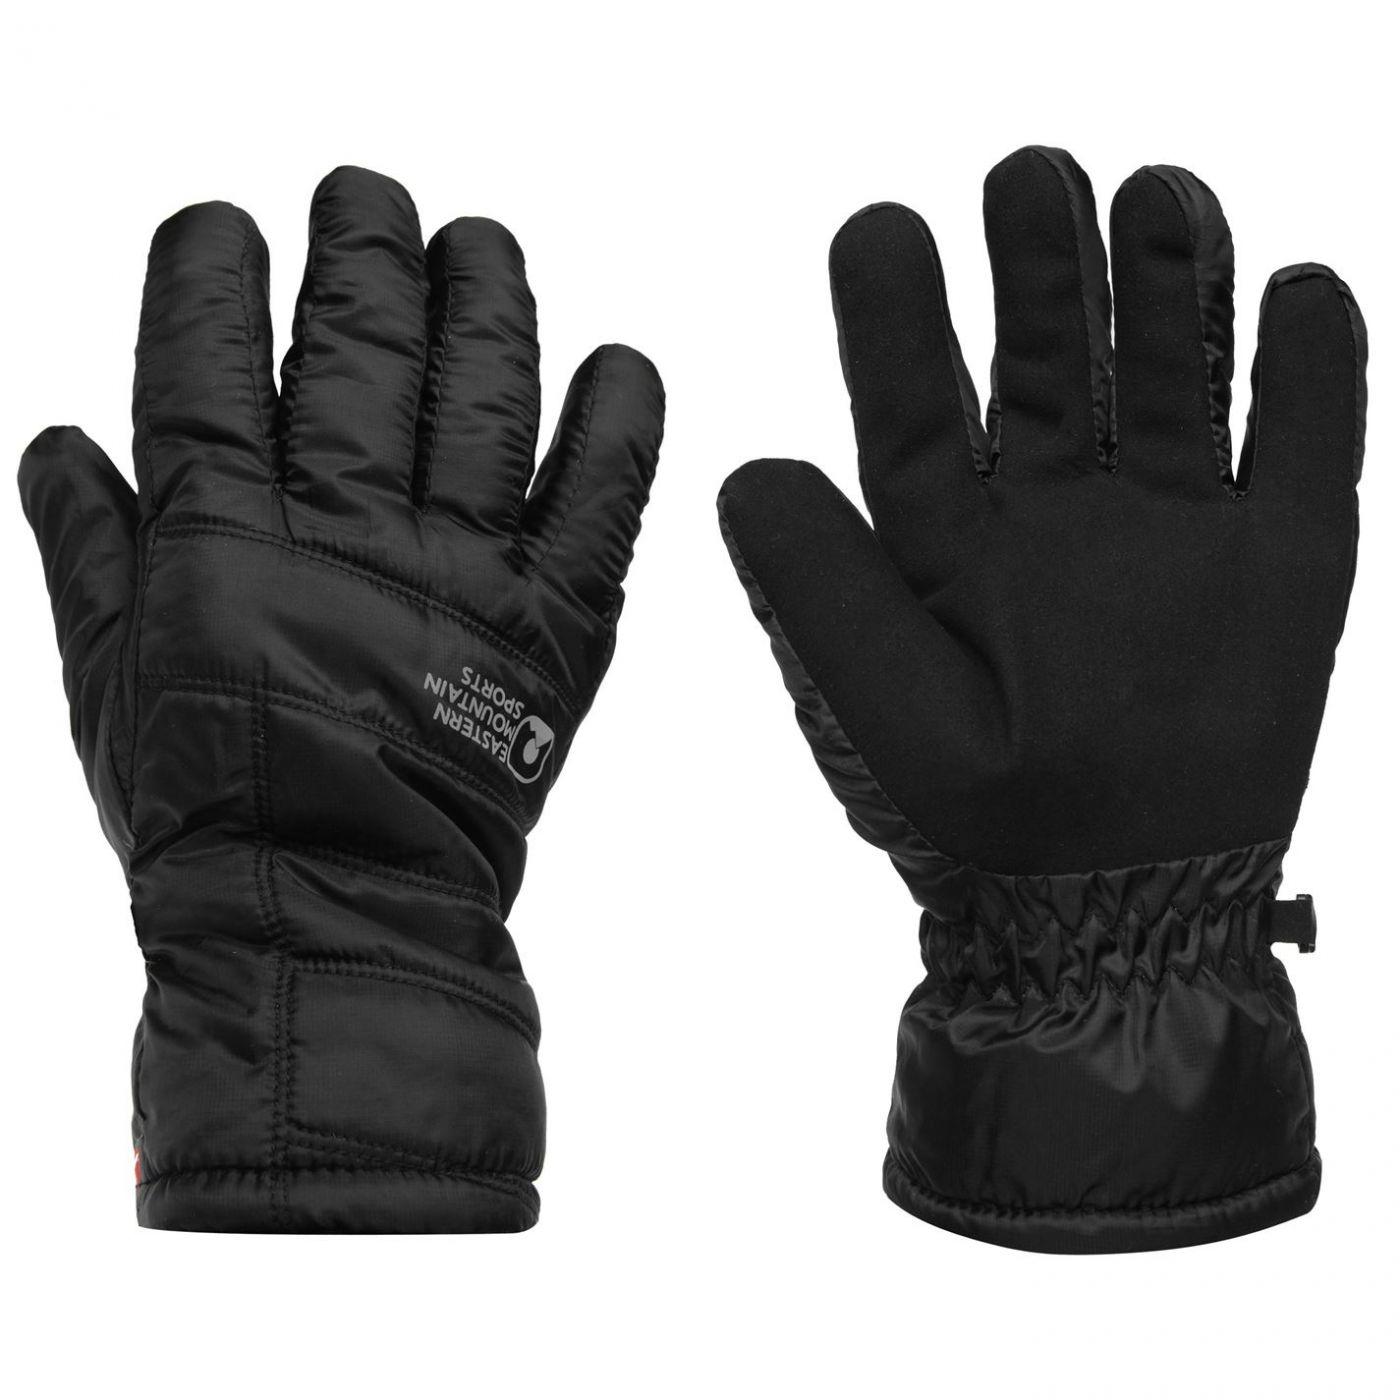 Eastern Mountain Sports M Mercury Glove Sn91